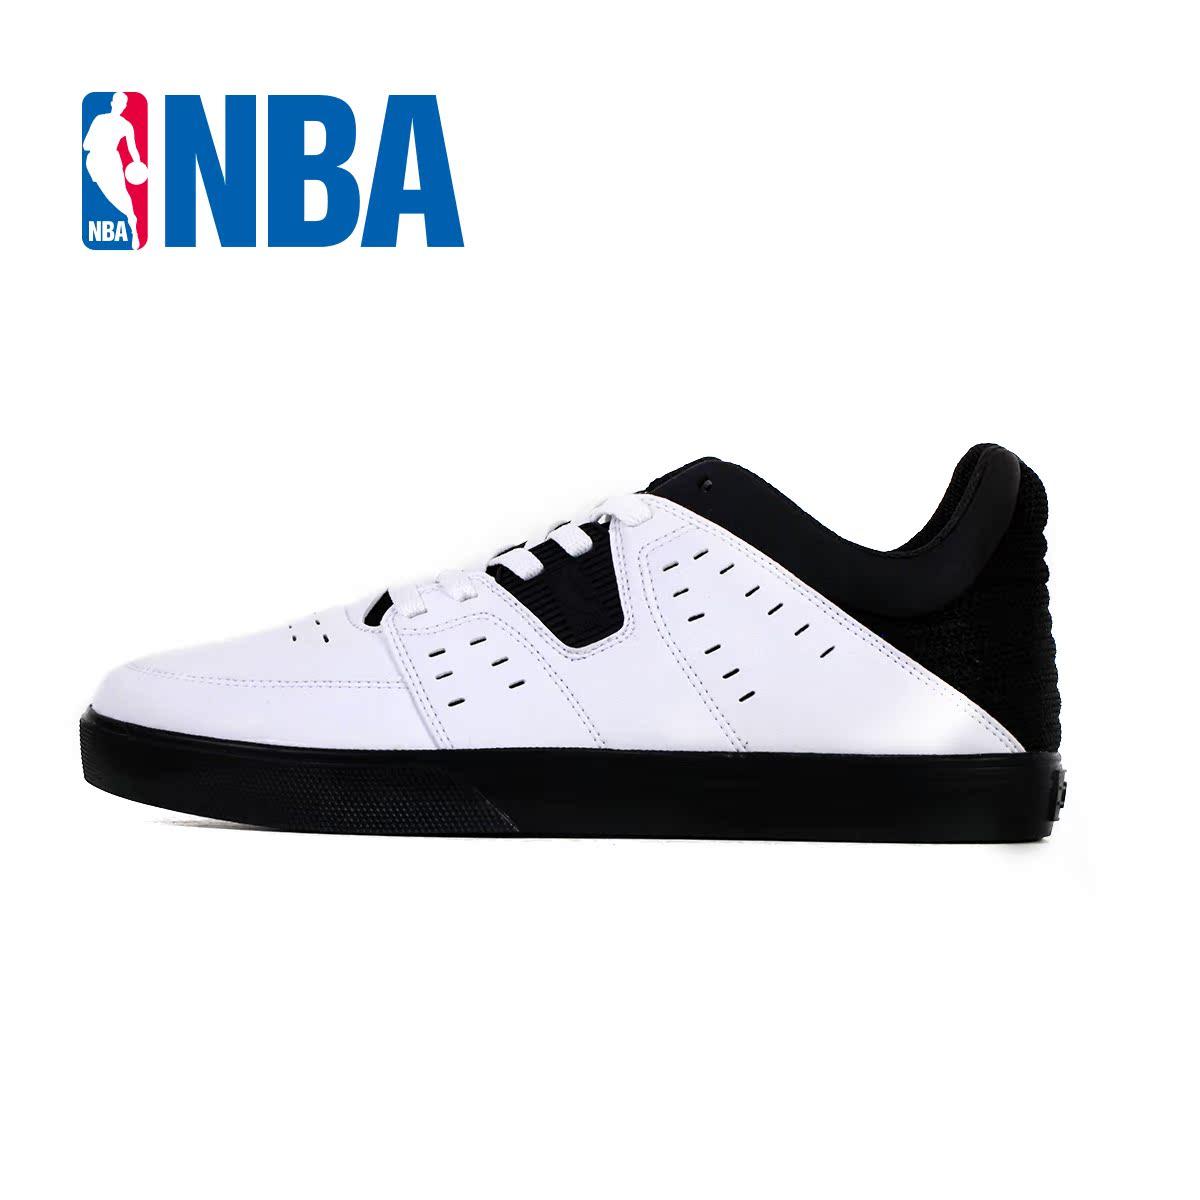 nba鞋会 球鞋新款篮球文化鞋 黑白休闲时尚护踝防滑系带低帮板鞋图片